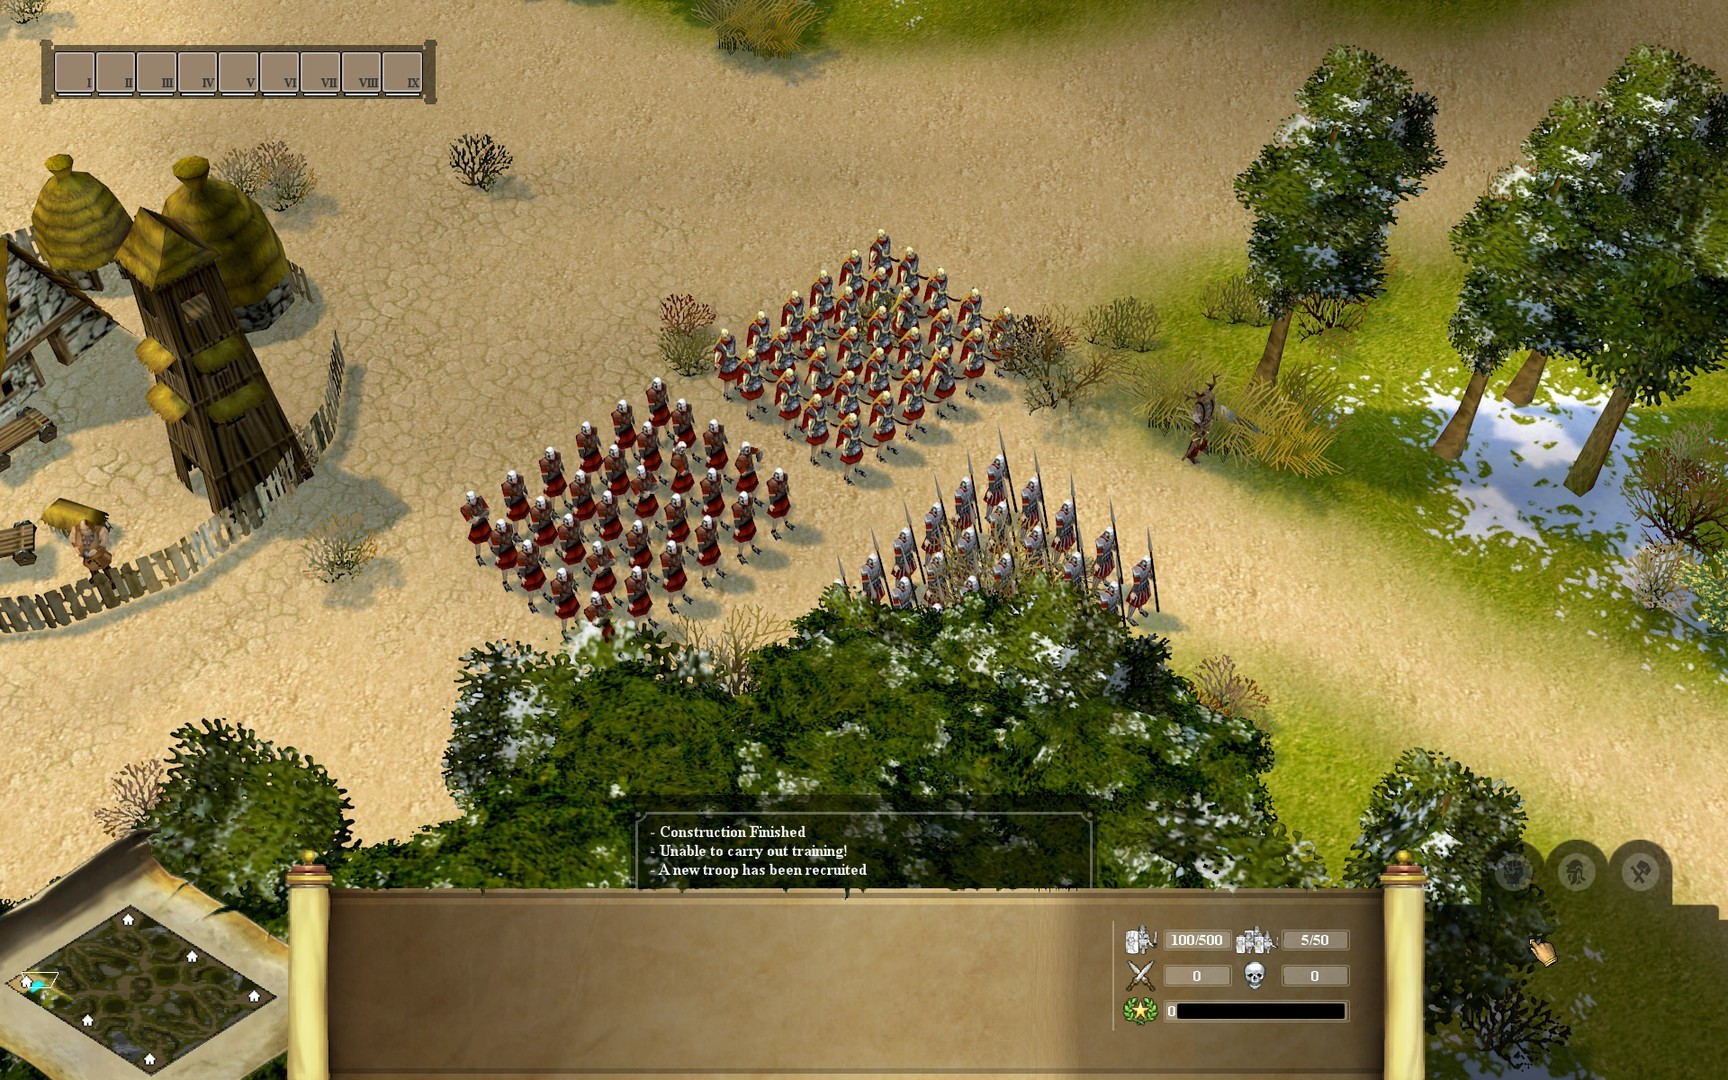 commandos-2-hd-remaster-praetorians-hd-remaster (3)